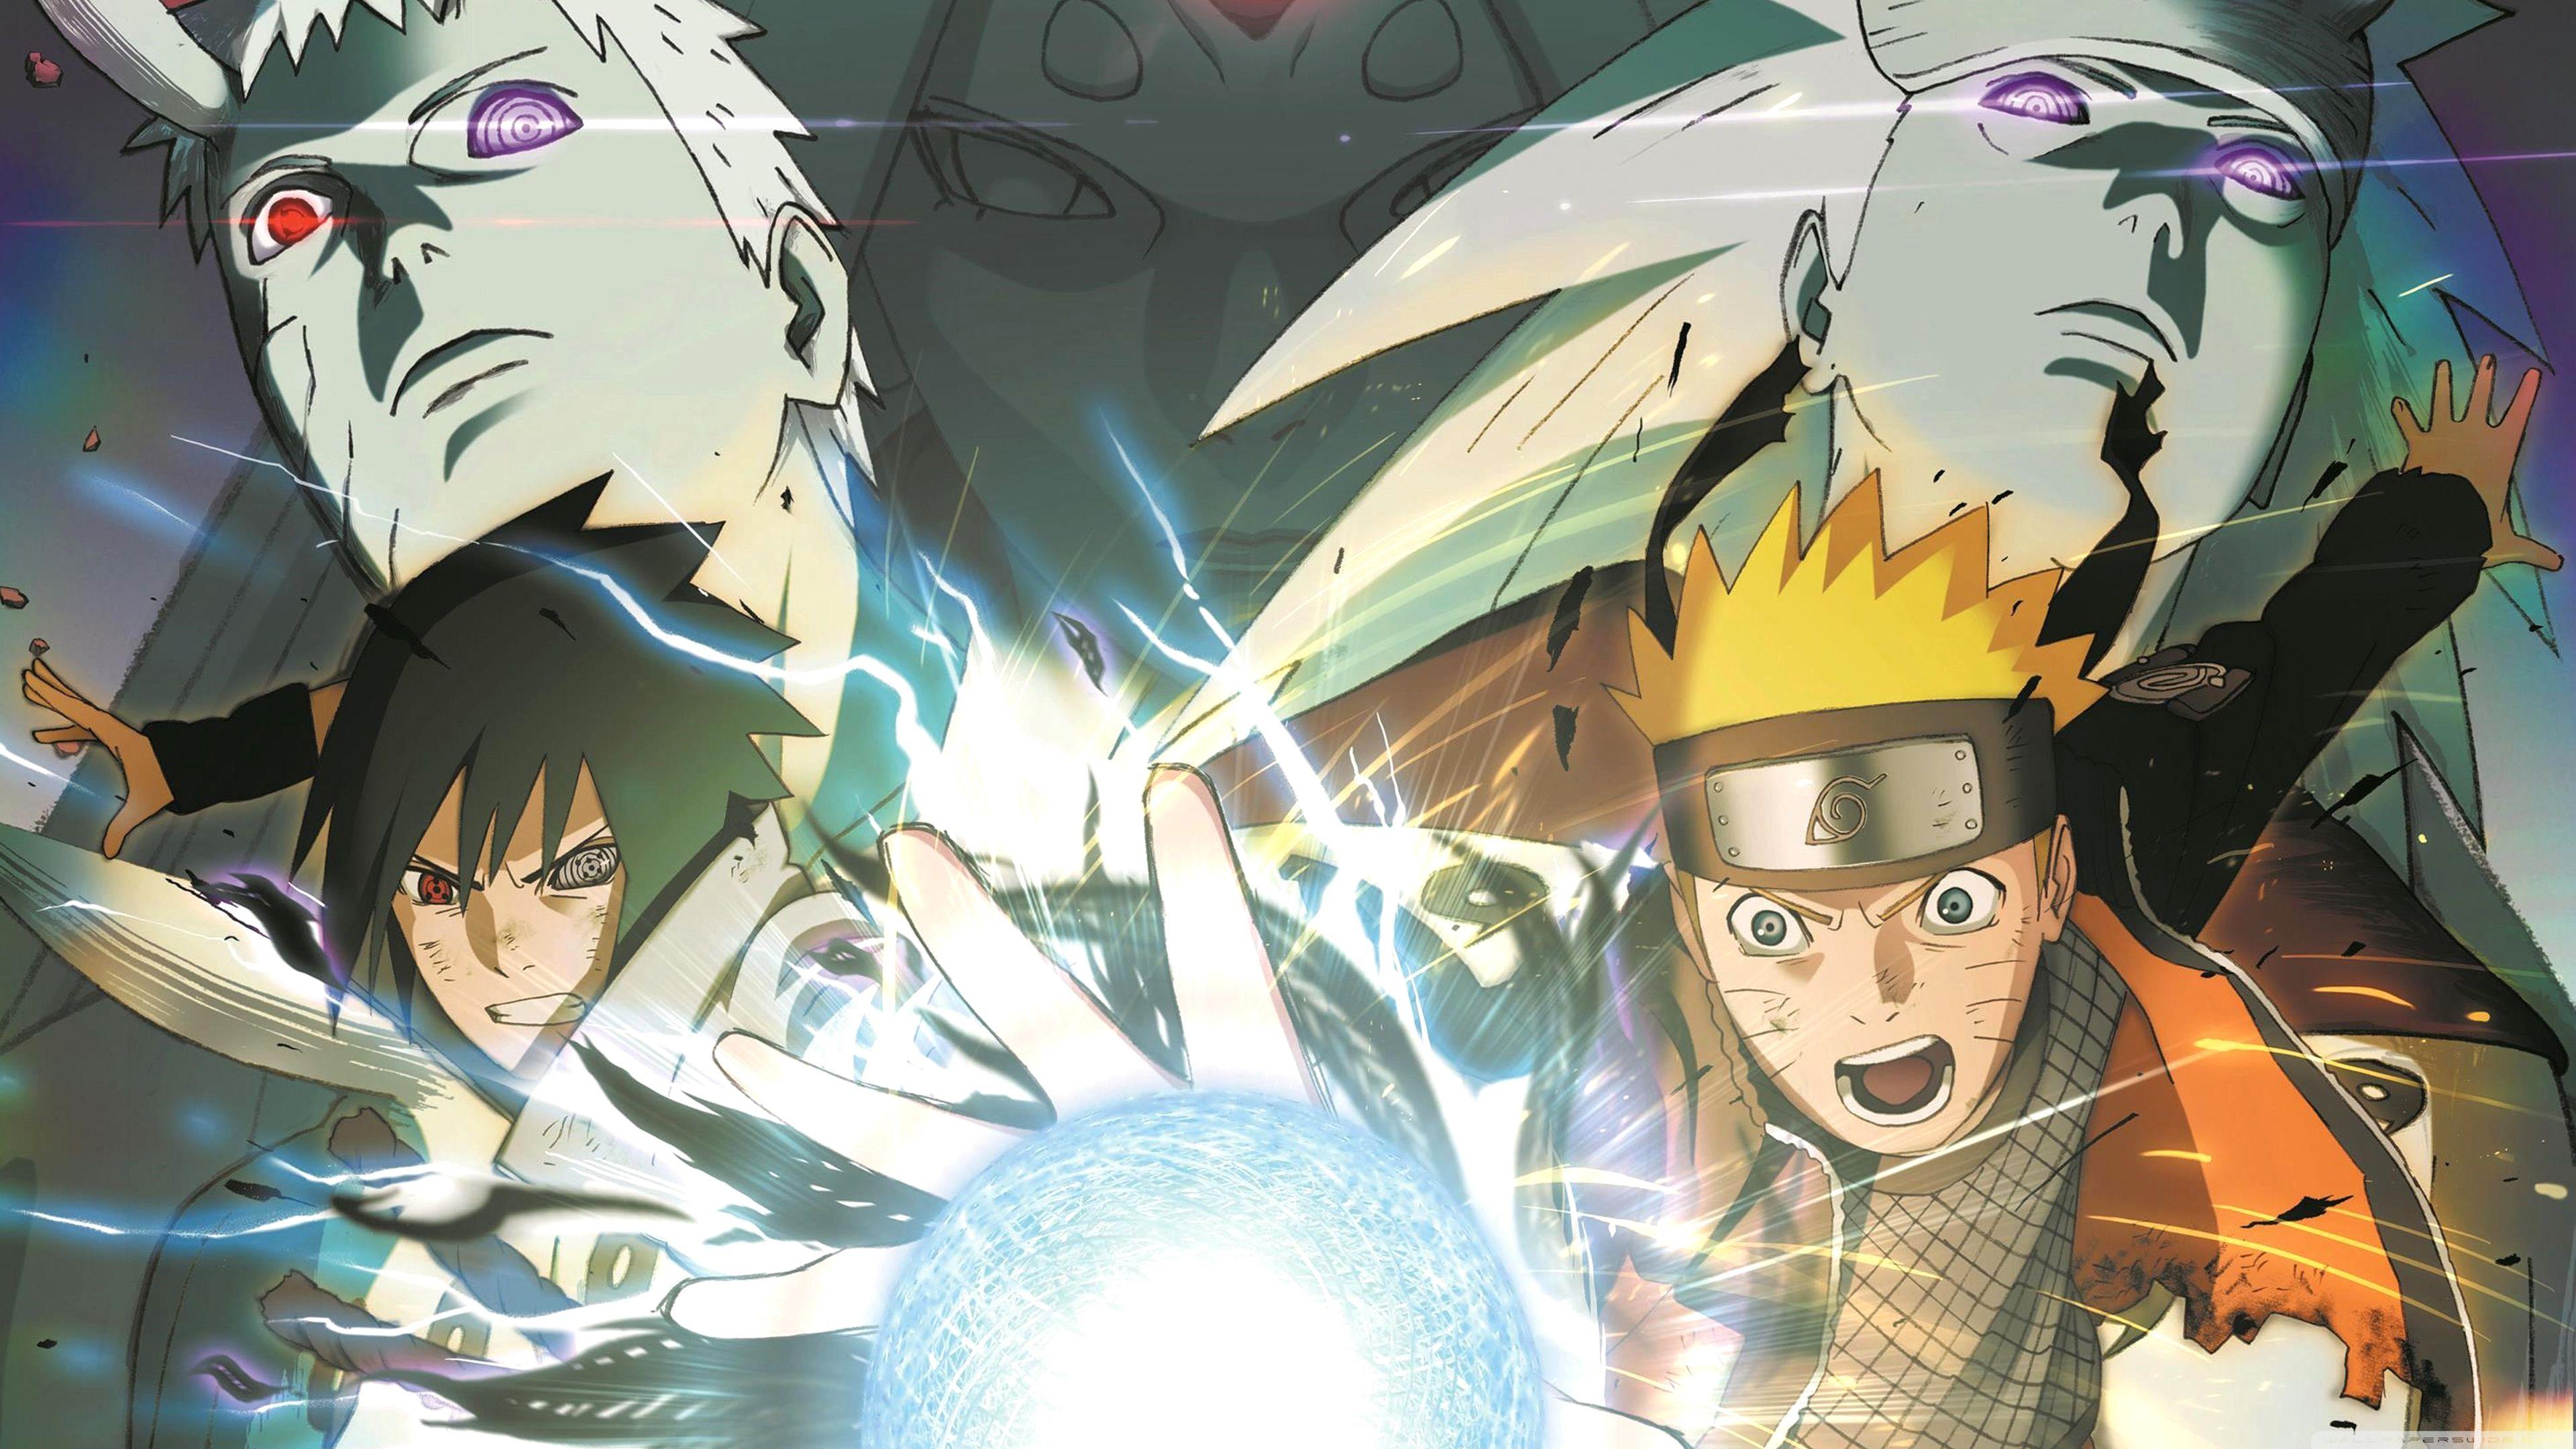 4k Wallpapers For Pc Naruto Gallery Naruto Wallpaper Wallpaper Naruto Shippuden Anime